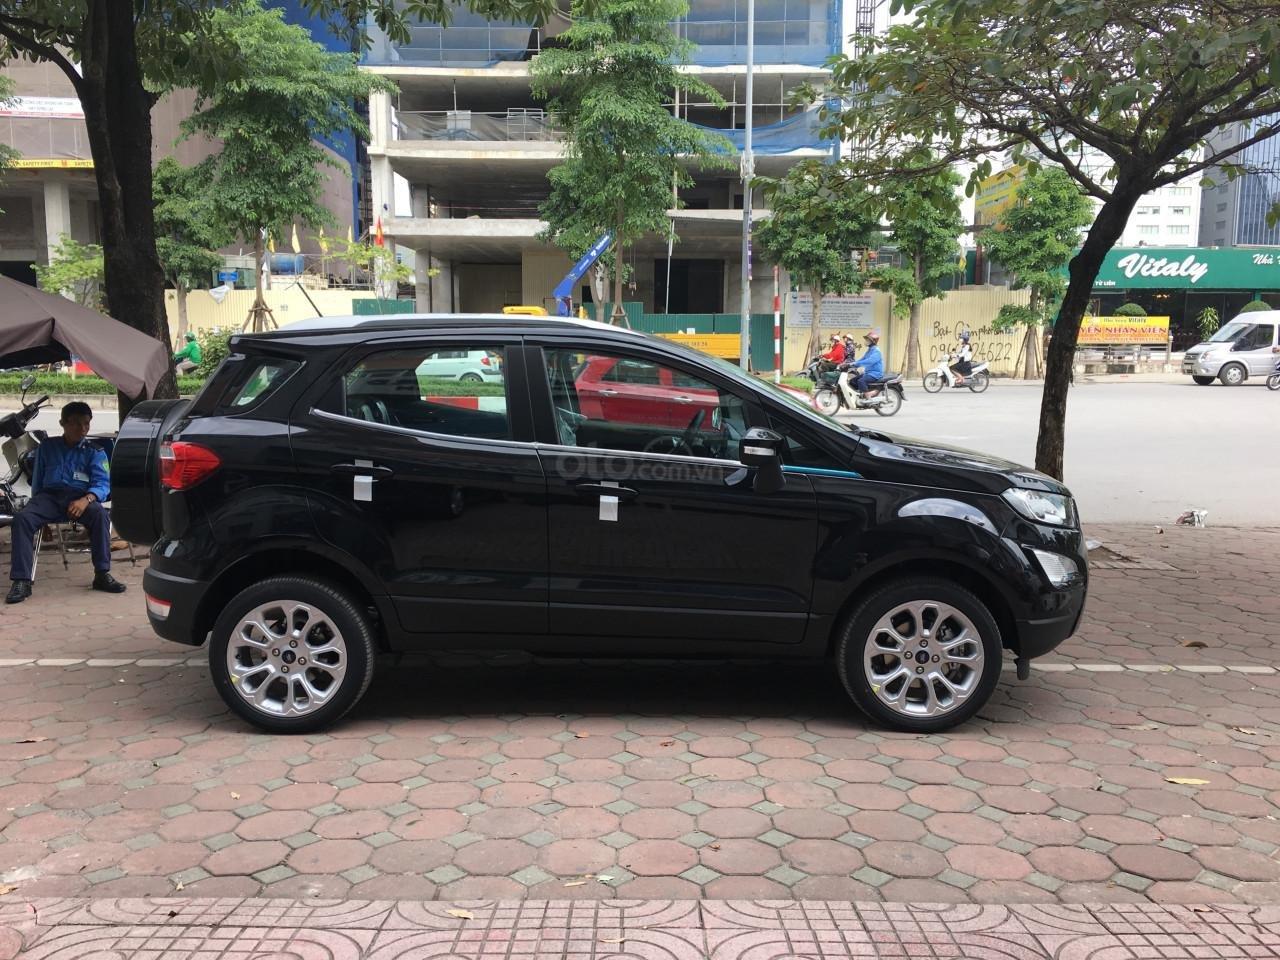 0358548613 - Bán xe Ford EcoSport Titanium 1.5L - tặng ngay bảo hiểm thân vỏ khi mua Ecosport Titanium mới-0